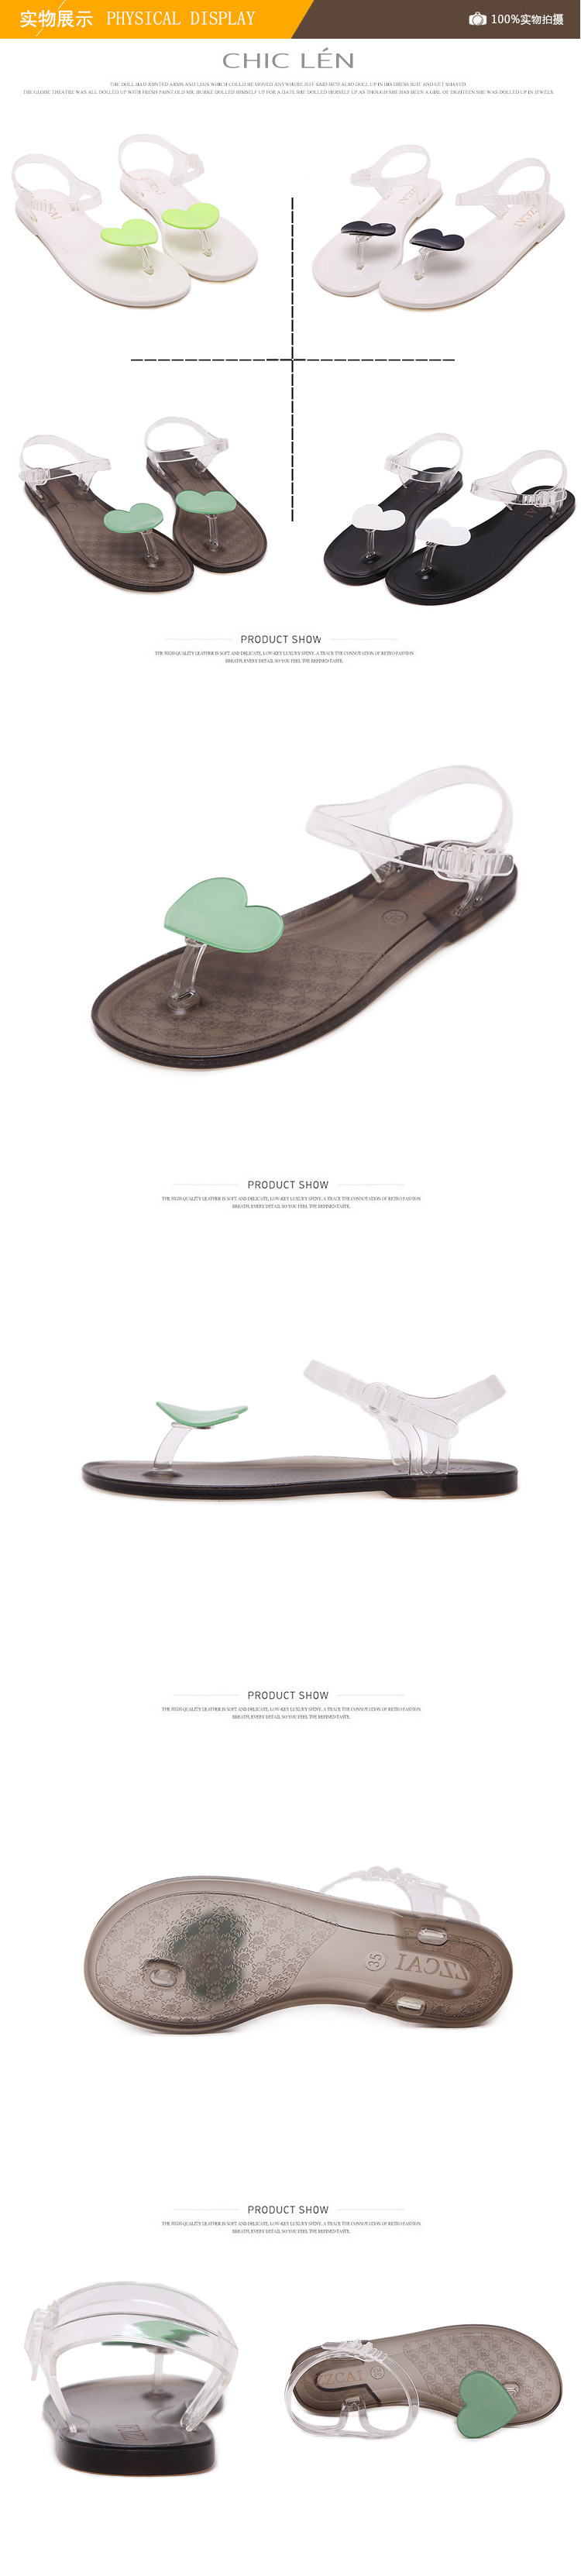 2018 Women Shoes New Summer Jelly Sandals Pvc Womens Heart Shaped Flat Lady Sepatu Sendal Wanita Flowers Plastic Wet Beach Fashion